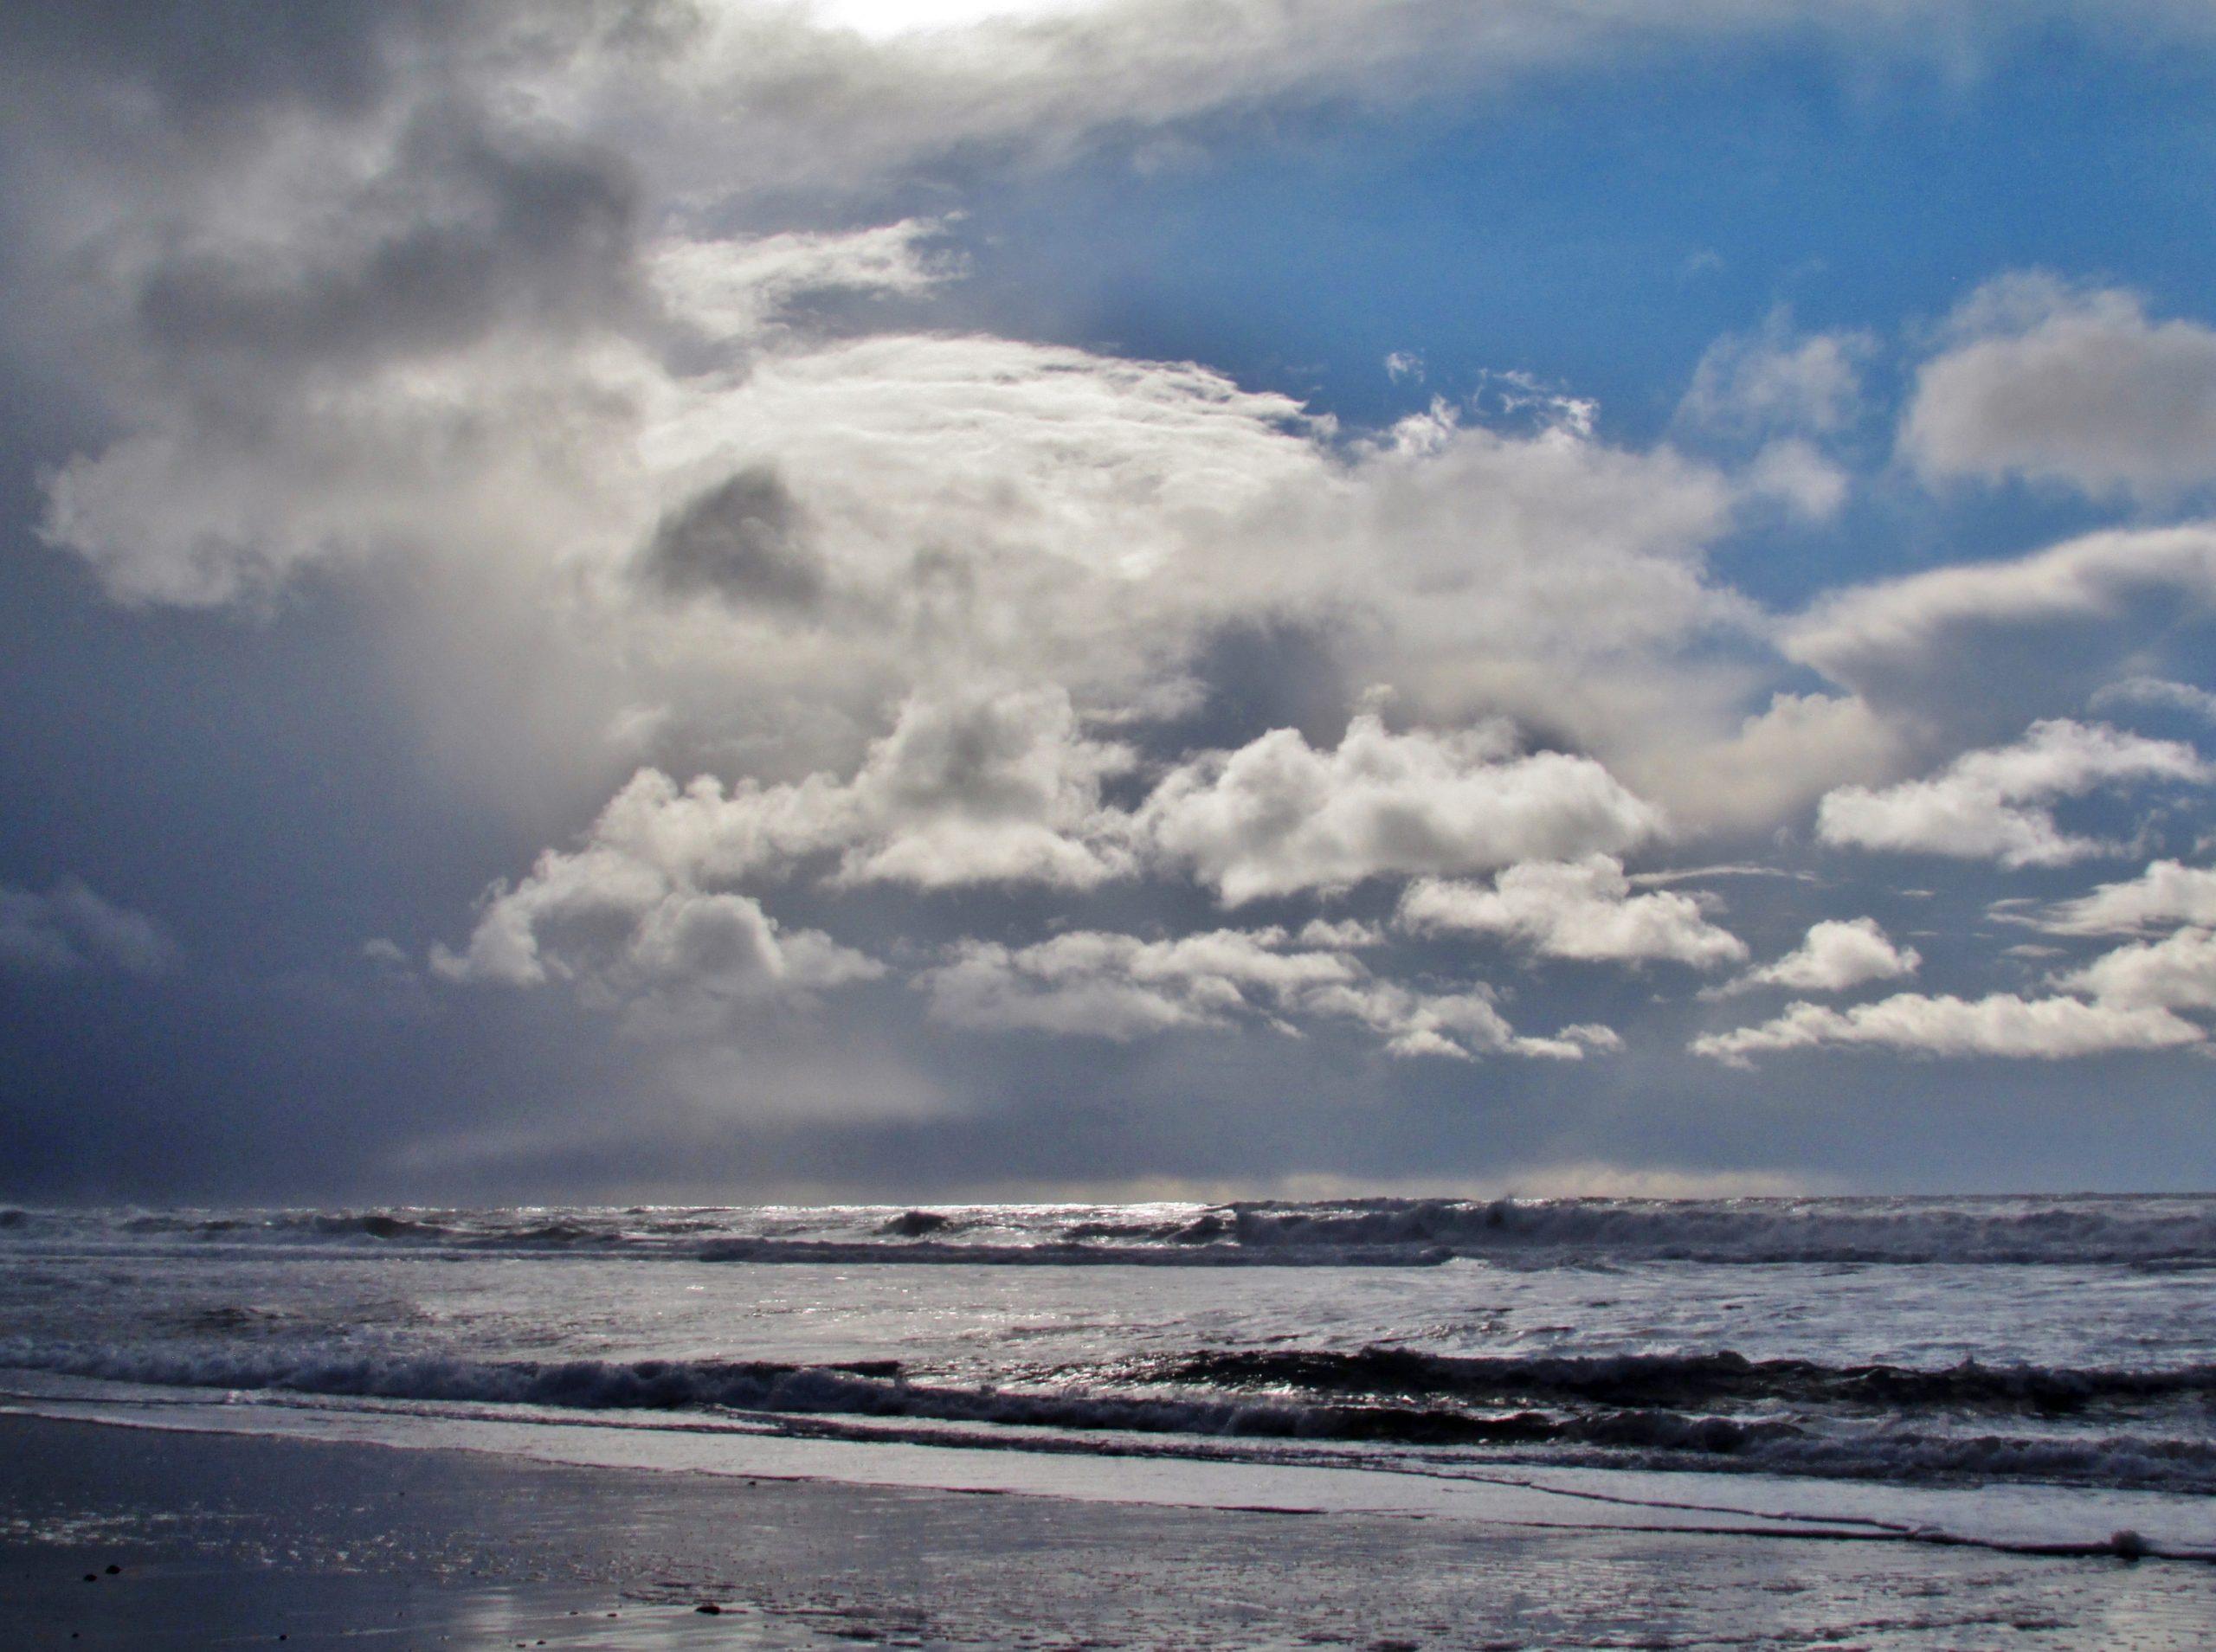 Storm on the horizon photos Lincolon City, Oregon